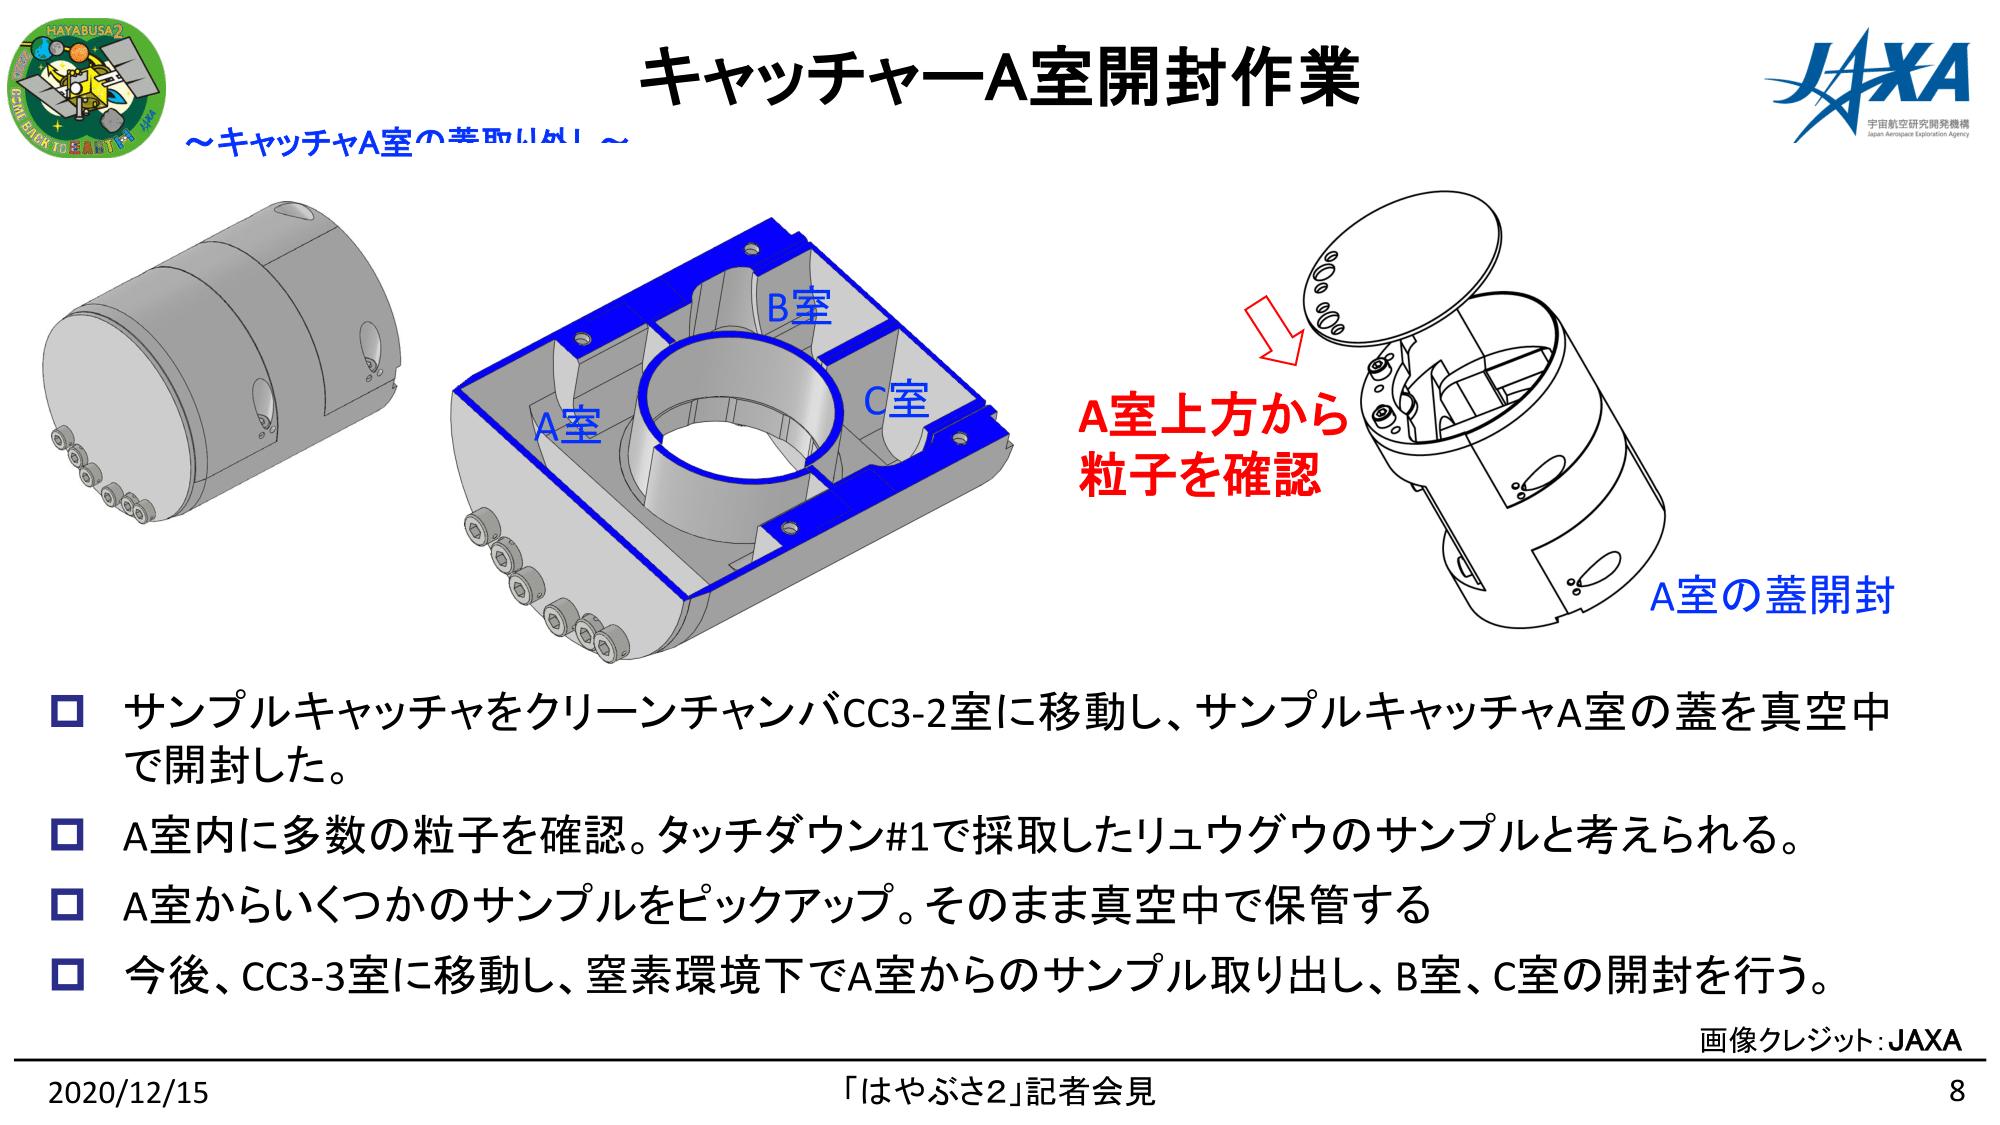 f:id:Imamura:20201215132053p:plain